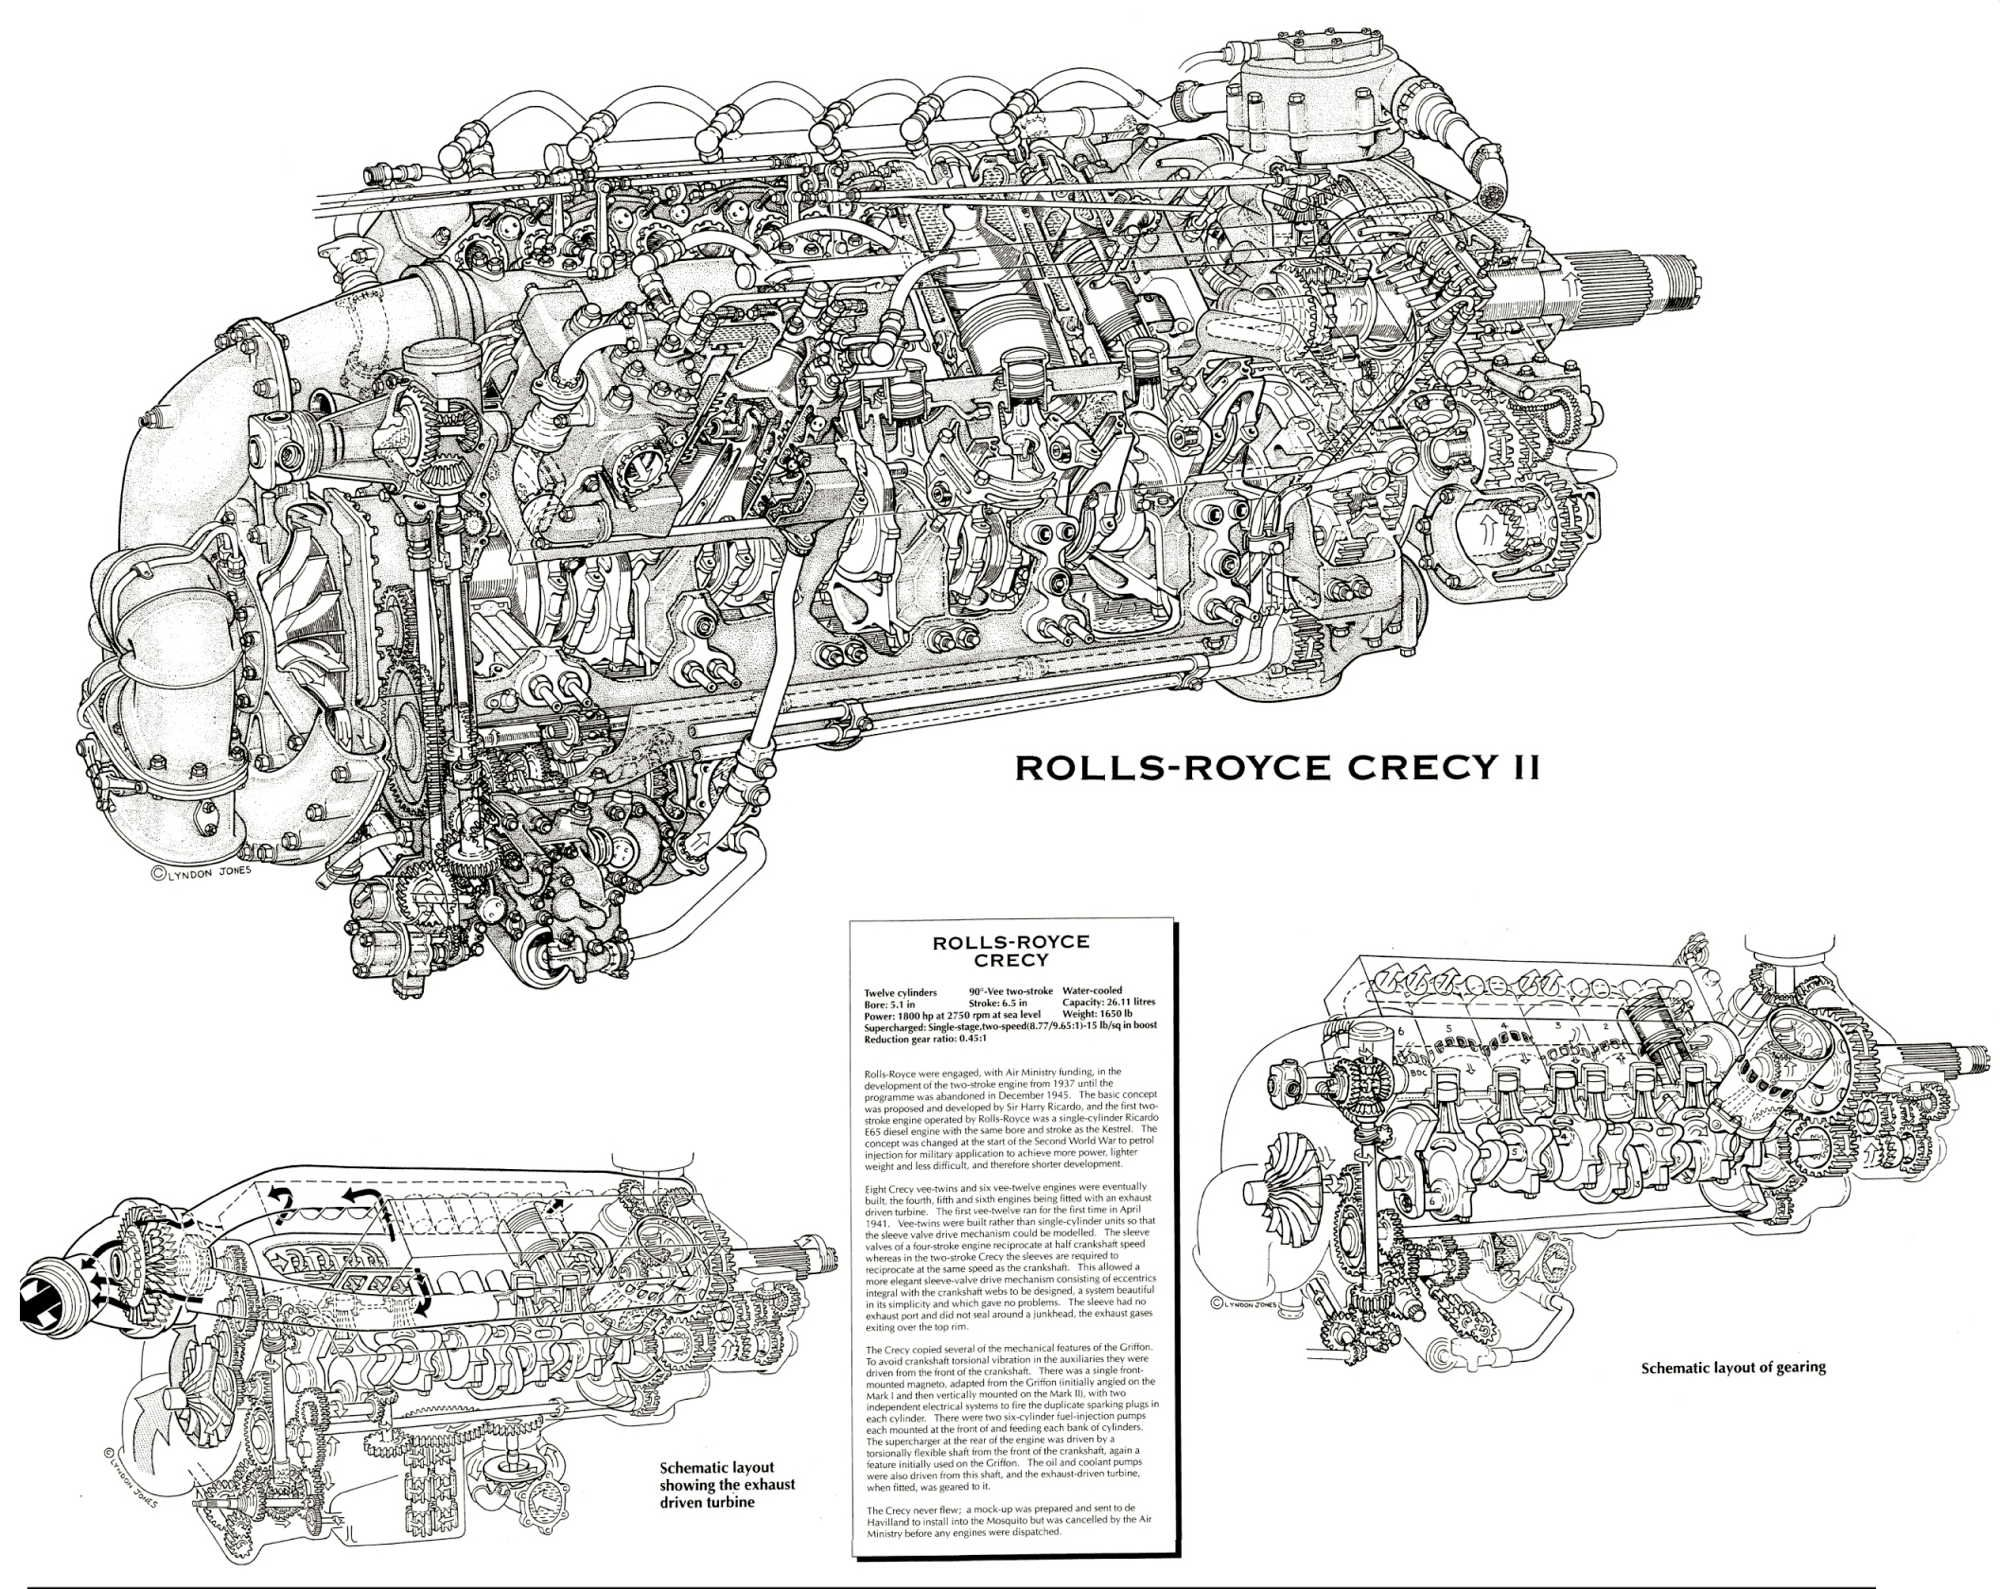 medium resolution of rolls royce crecy ii engine cutaway